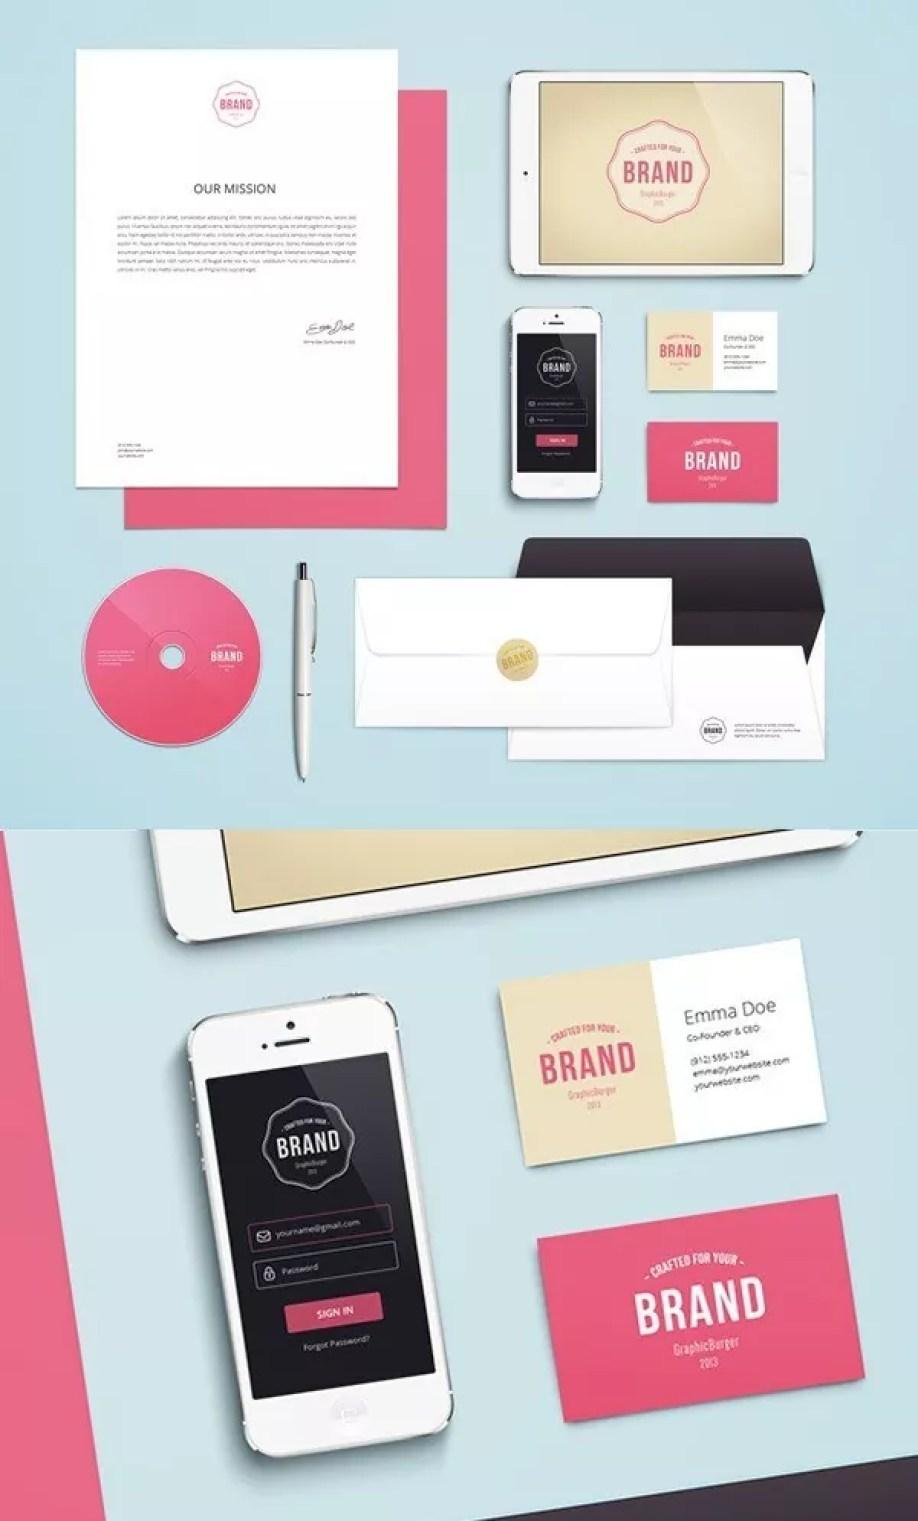 Freebie Branding Identity Mock Up Download - 60+ Branding, Identity & Stationery Free PSD Mockups